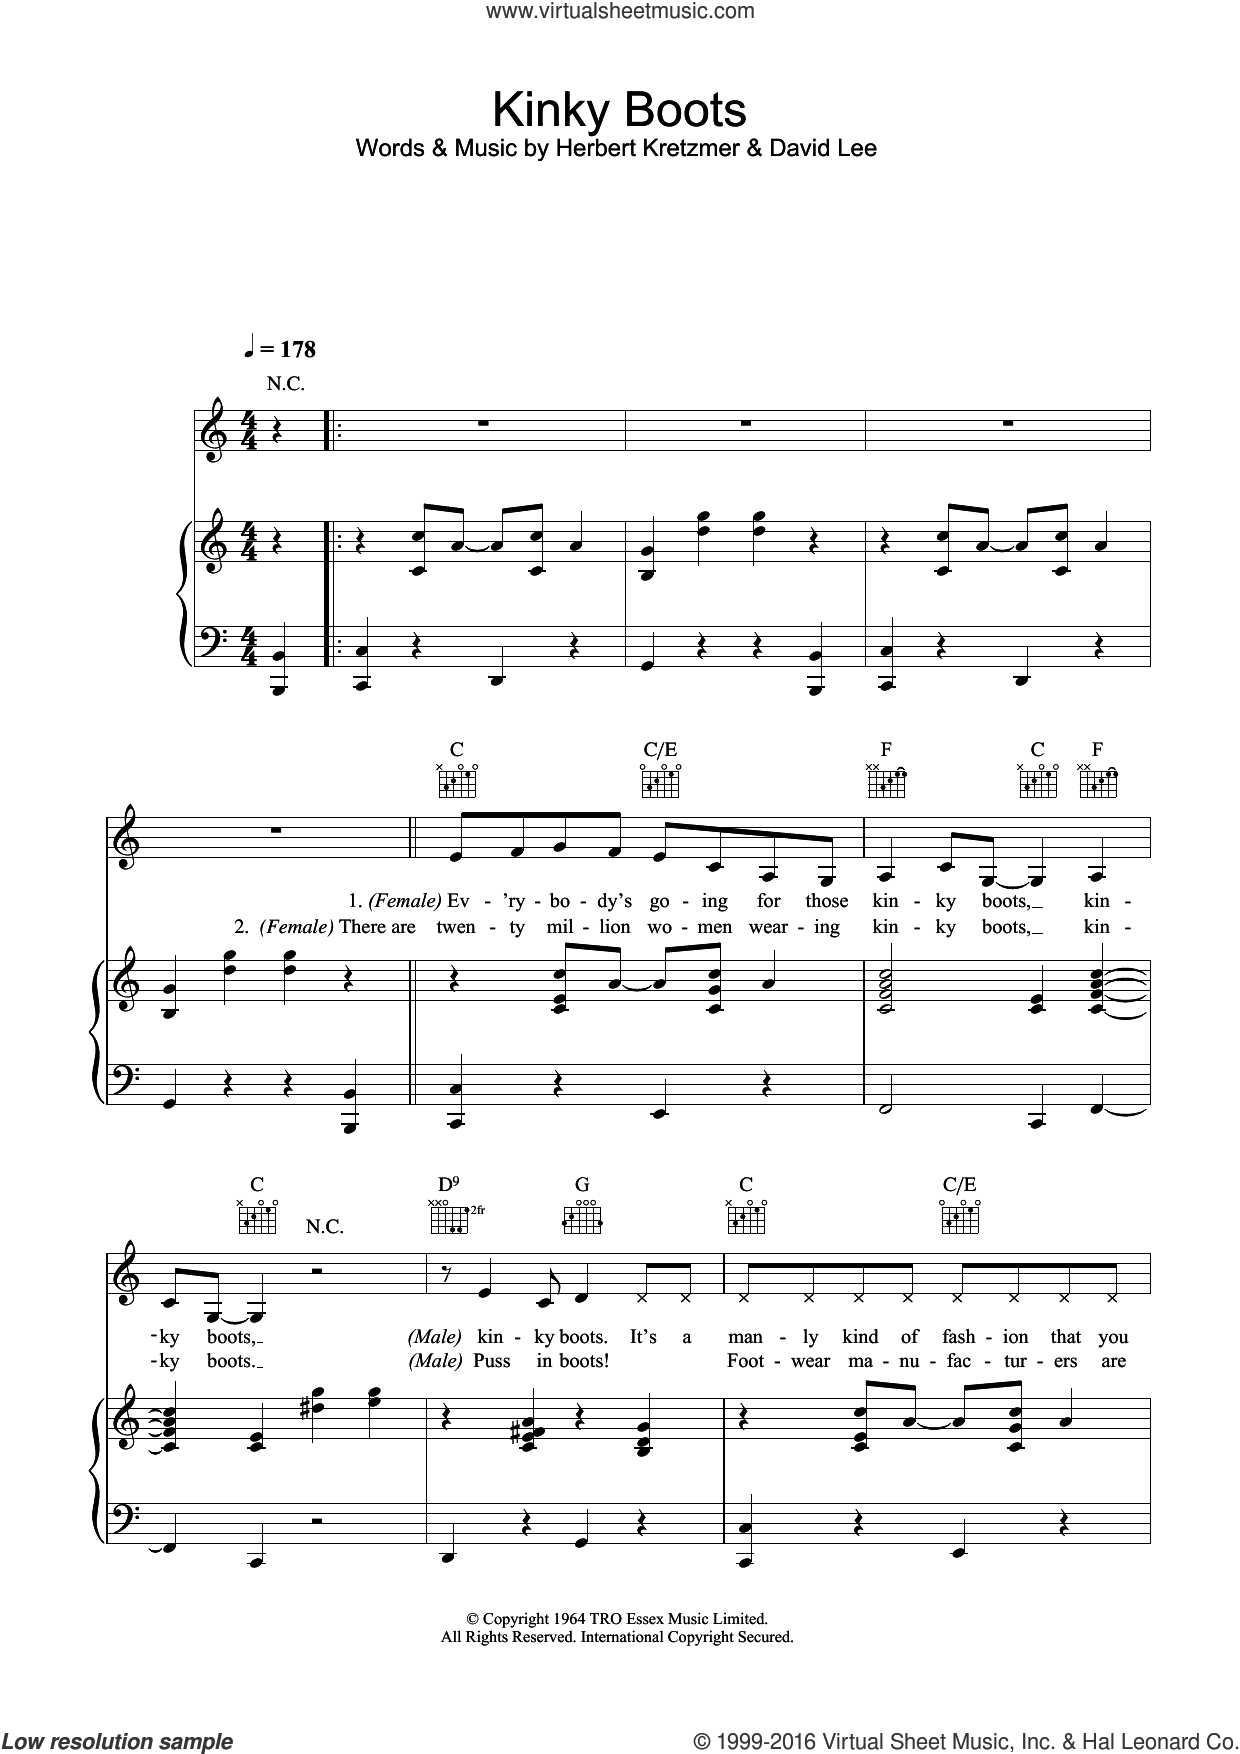 kinky boots sheet music pdf